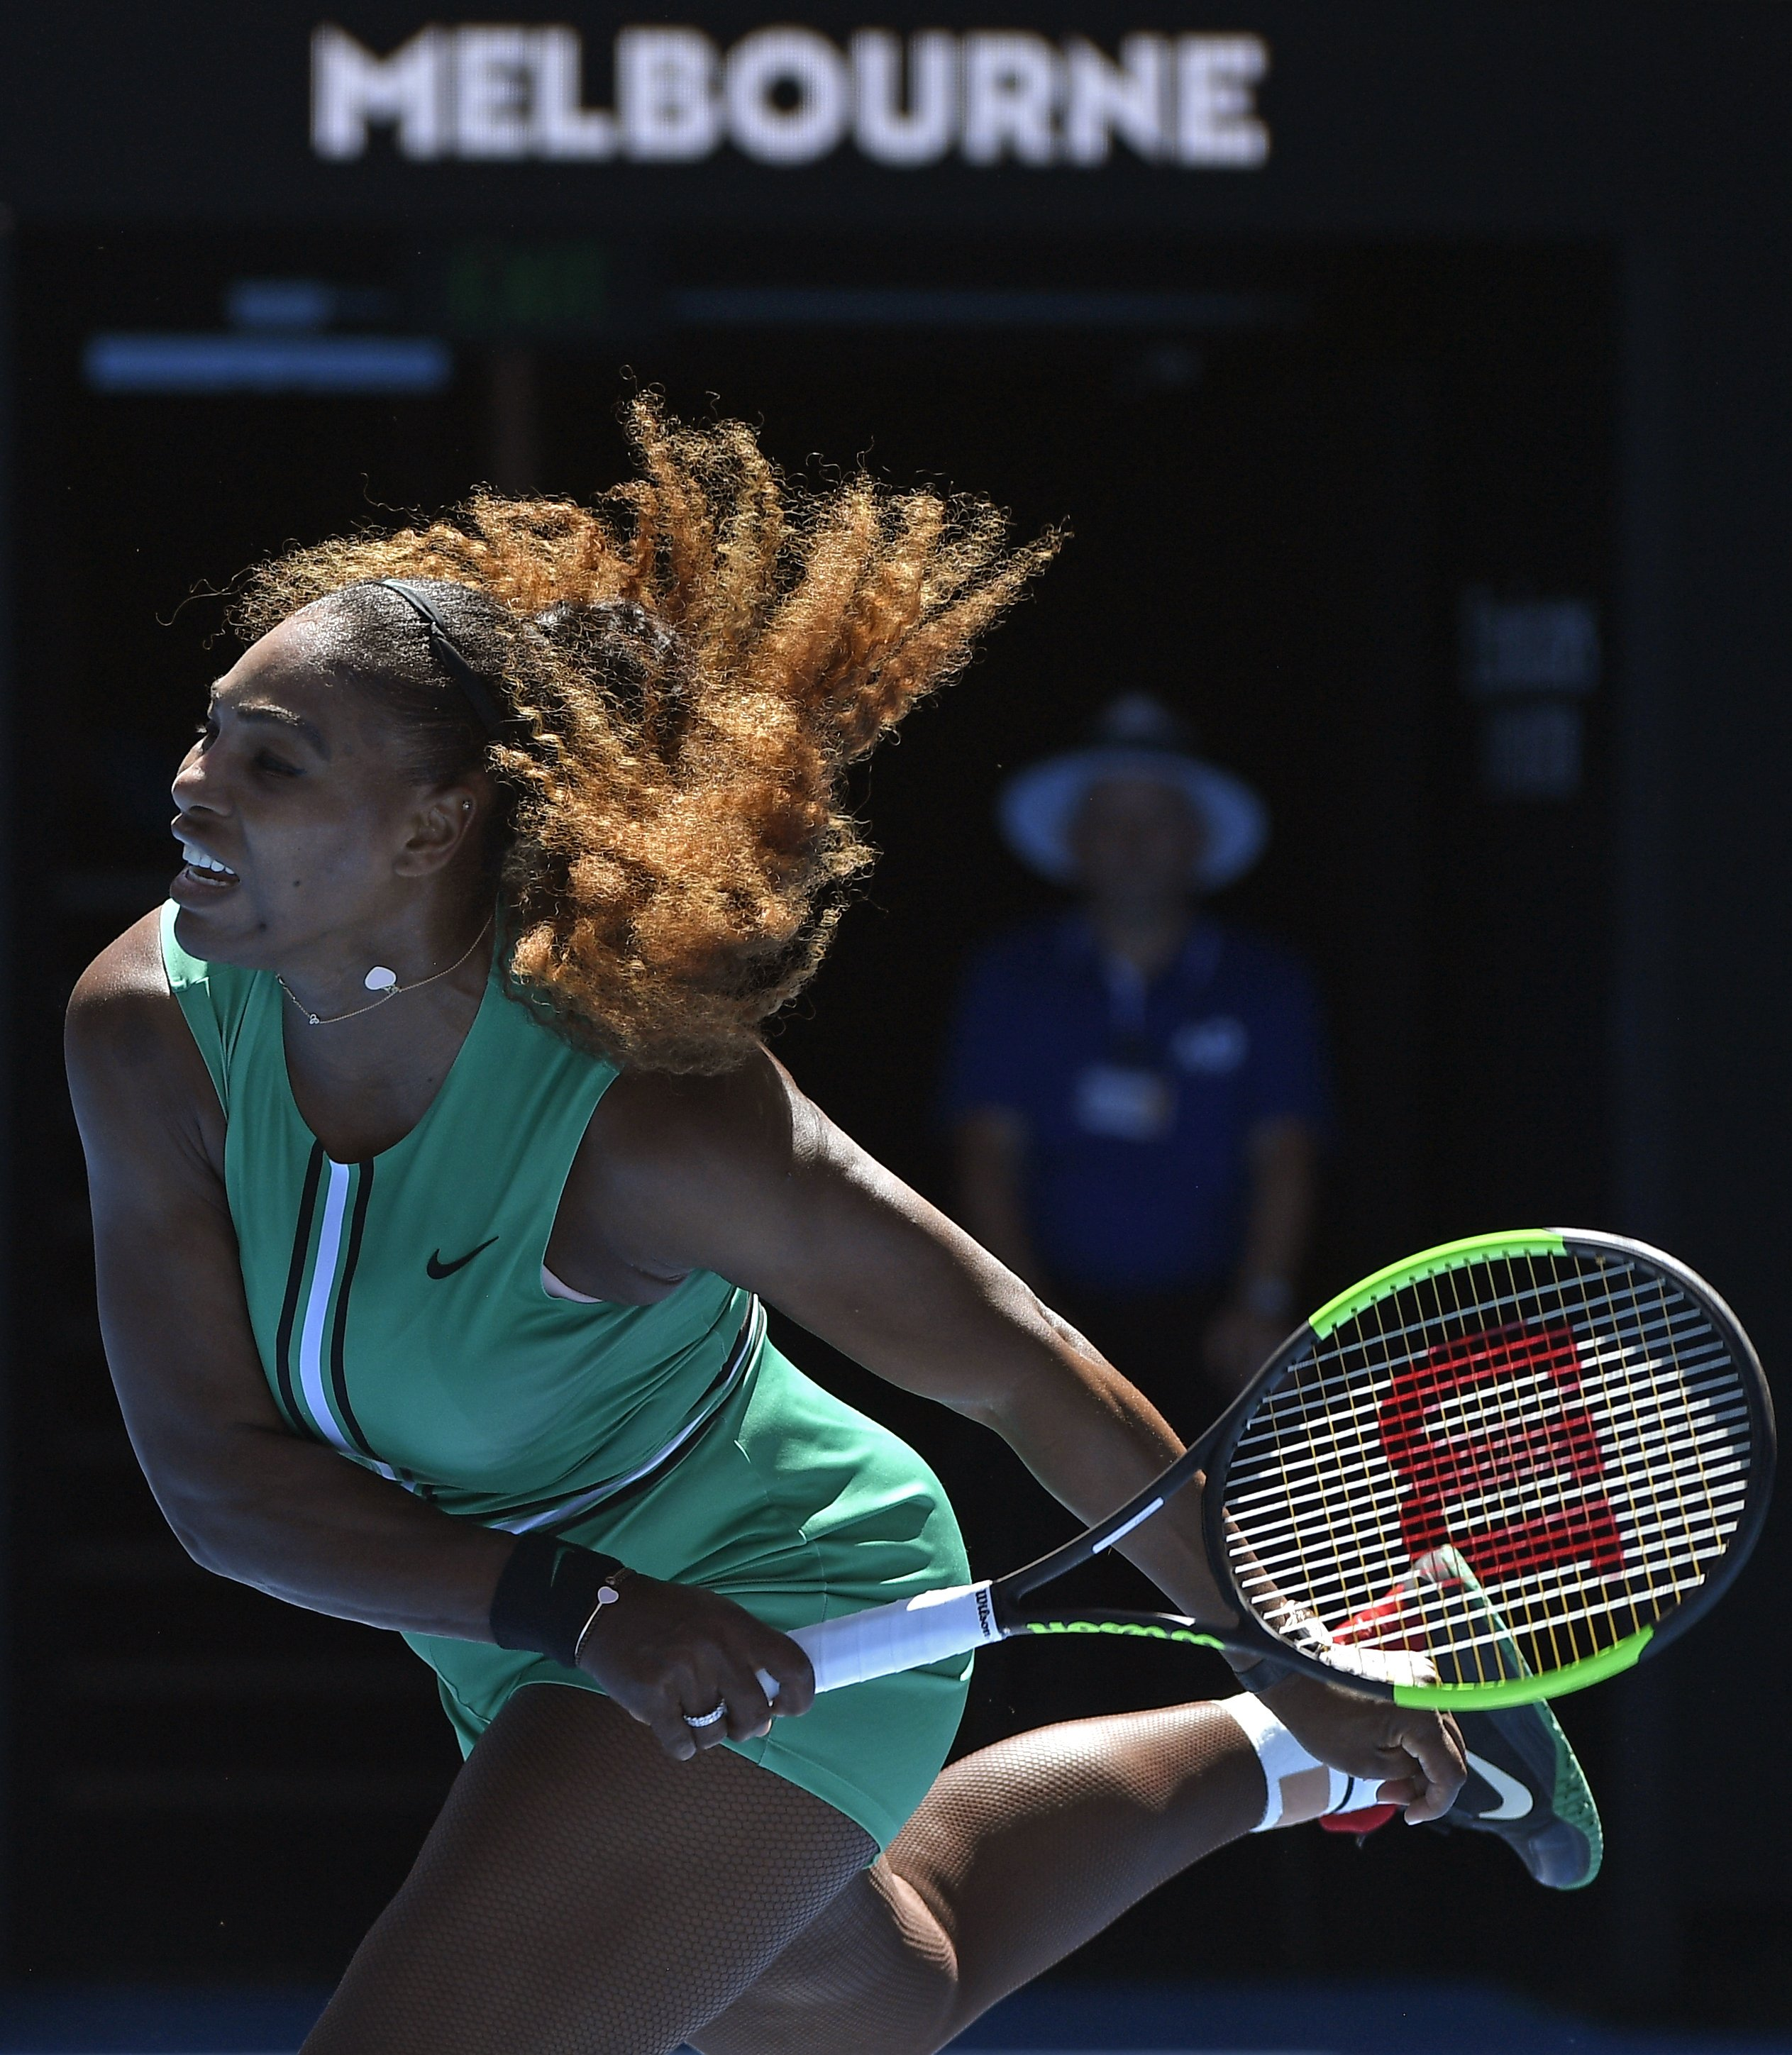 Serena vs No. 1 Halep at Australian Open feels like a final